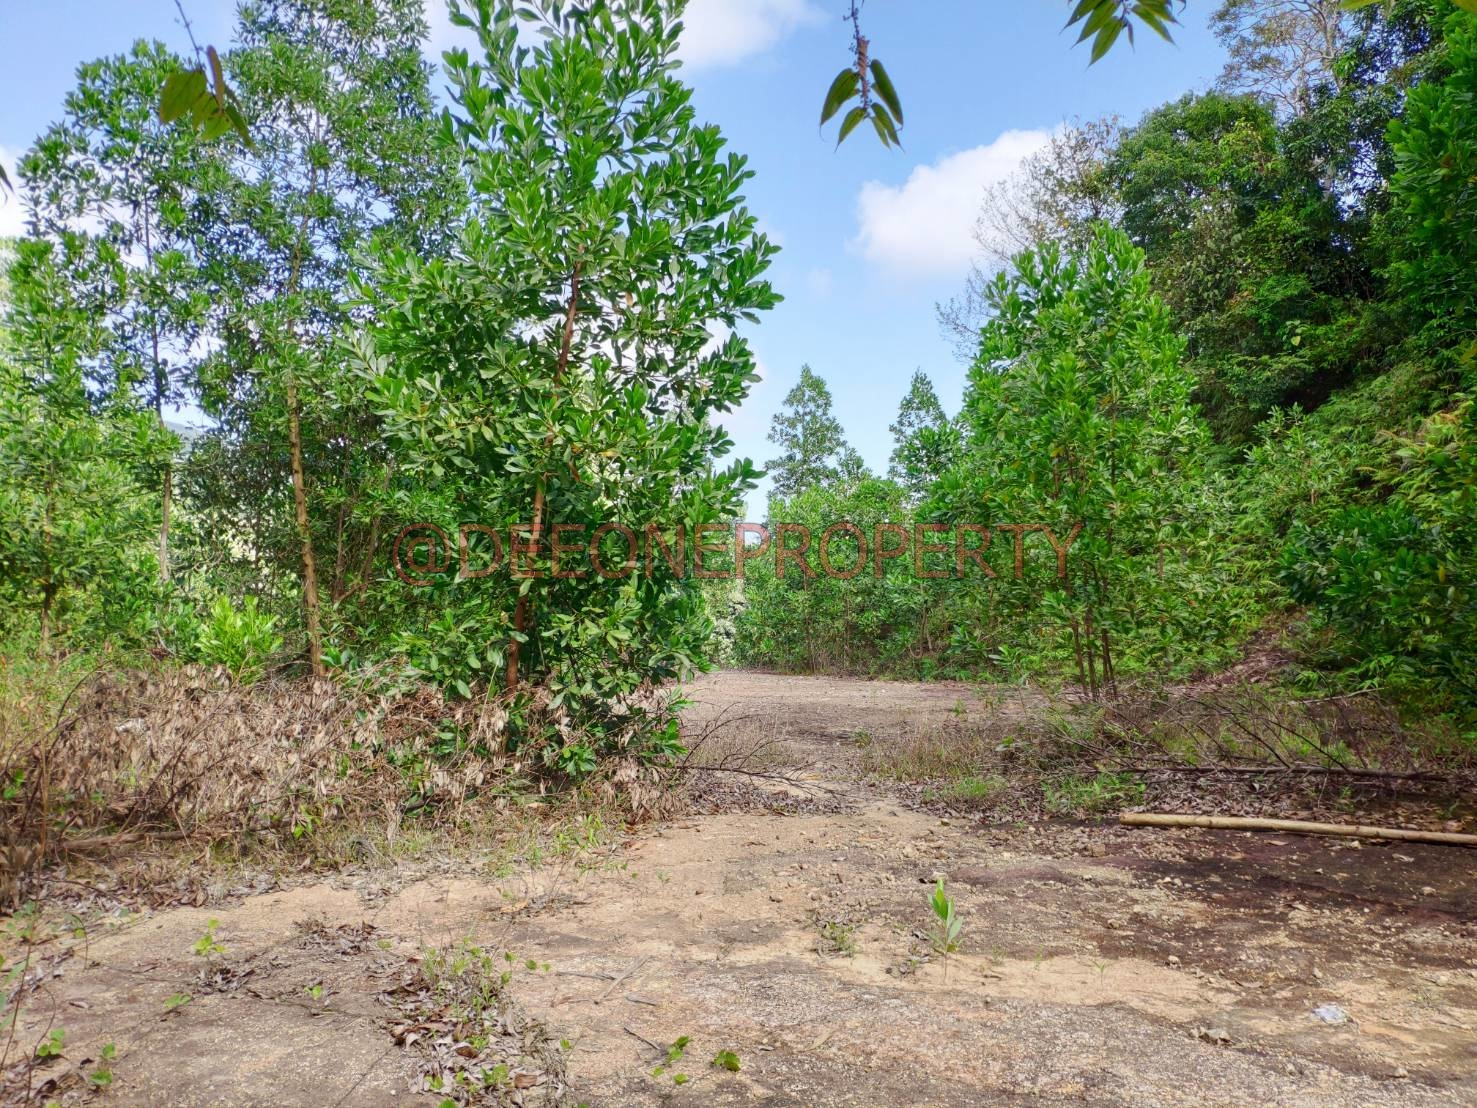 6 Rai+ Land Near Sea for Sale – South West Coast, Koh Chang